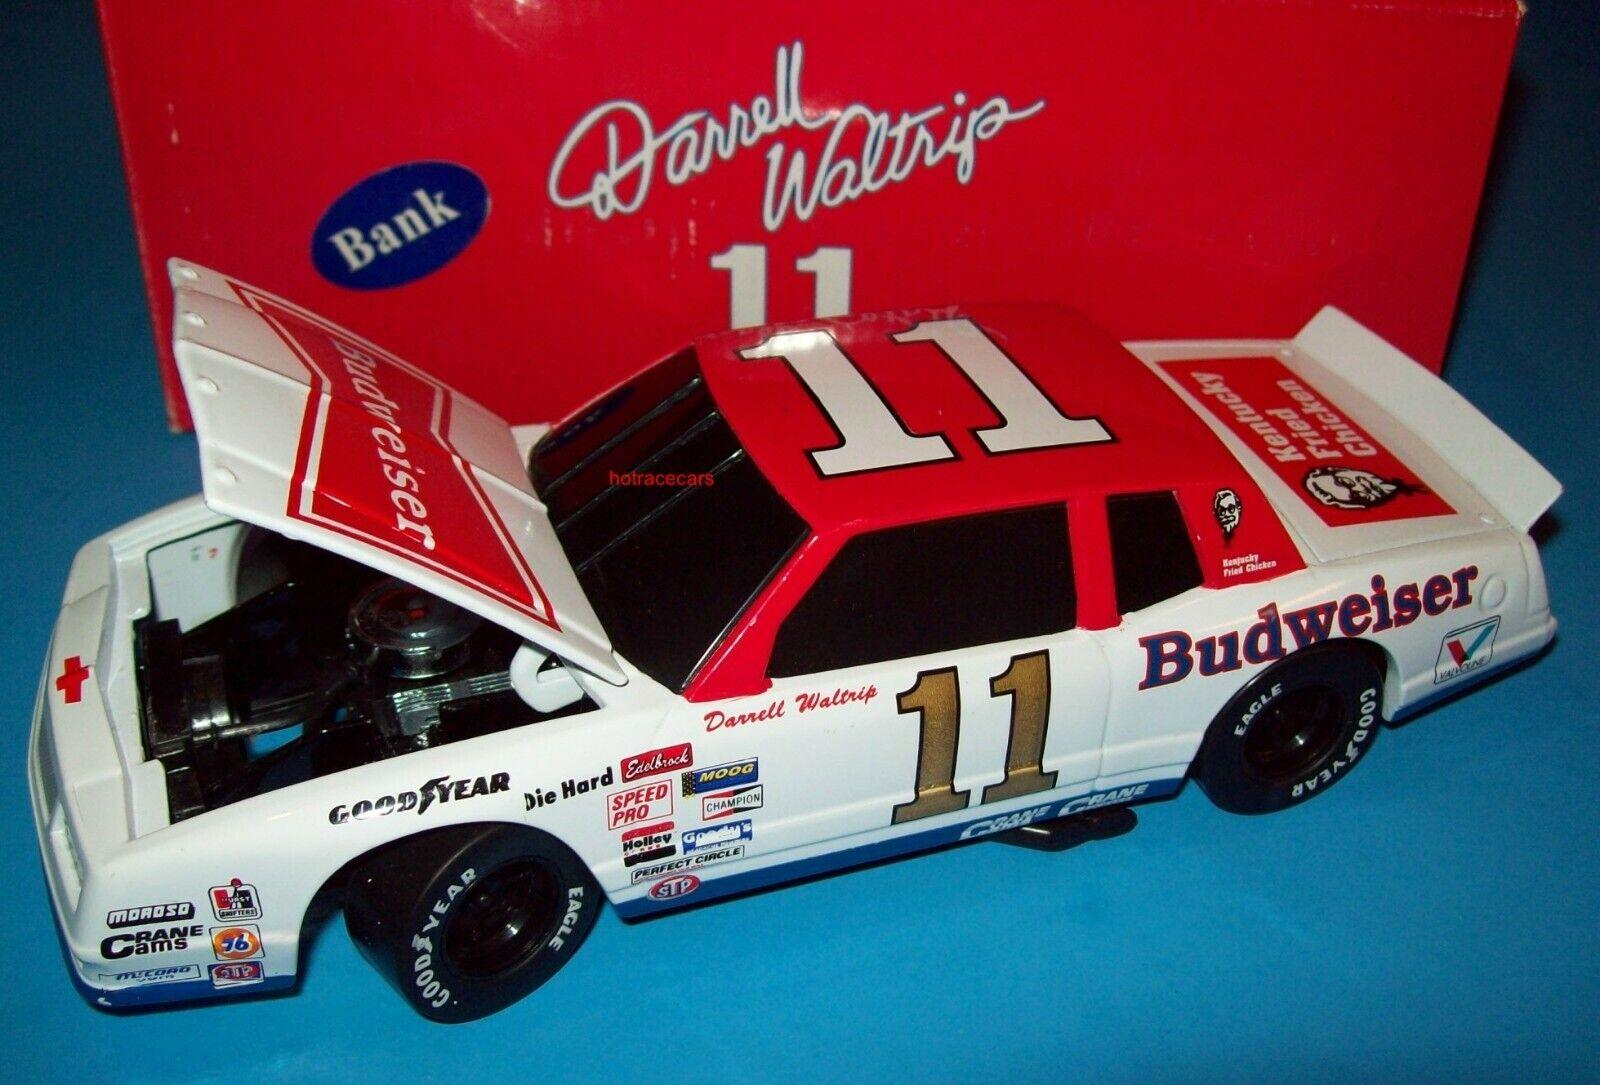 Darrell Waltrip 1984 Budweiser  11 Chevy Monte carlo 1 24 NASCAR vintage BWB nouveau